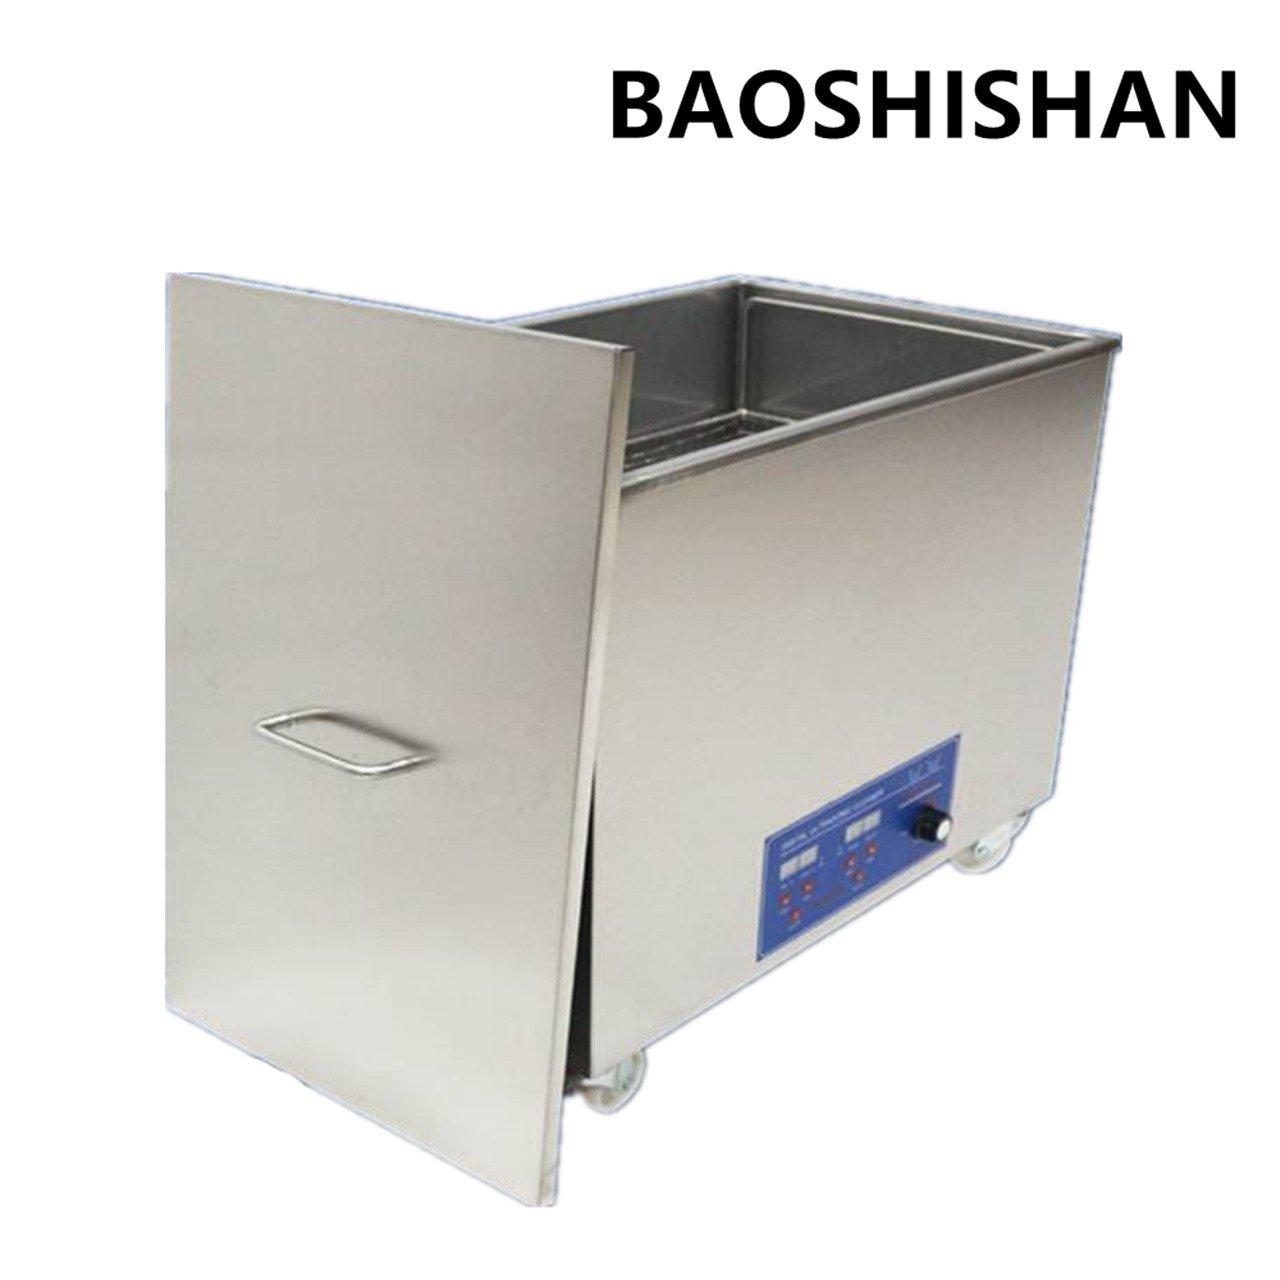 KS-240AL 120KHZ High Frequency Ultrasonic Cleaner 1440W 78L industrial ultrasonic cleaning machine & Free Basket B01MSBGX1R